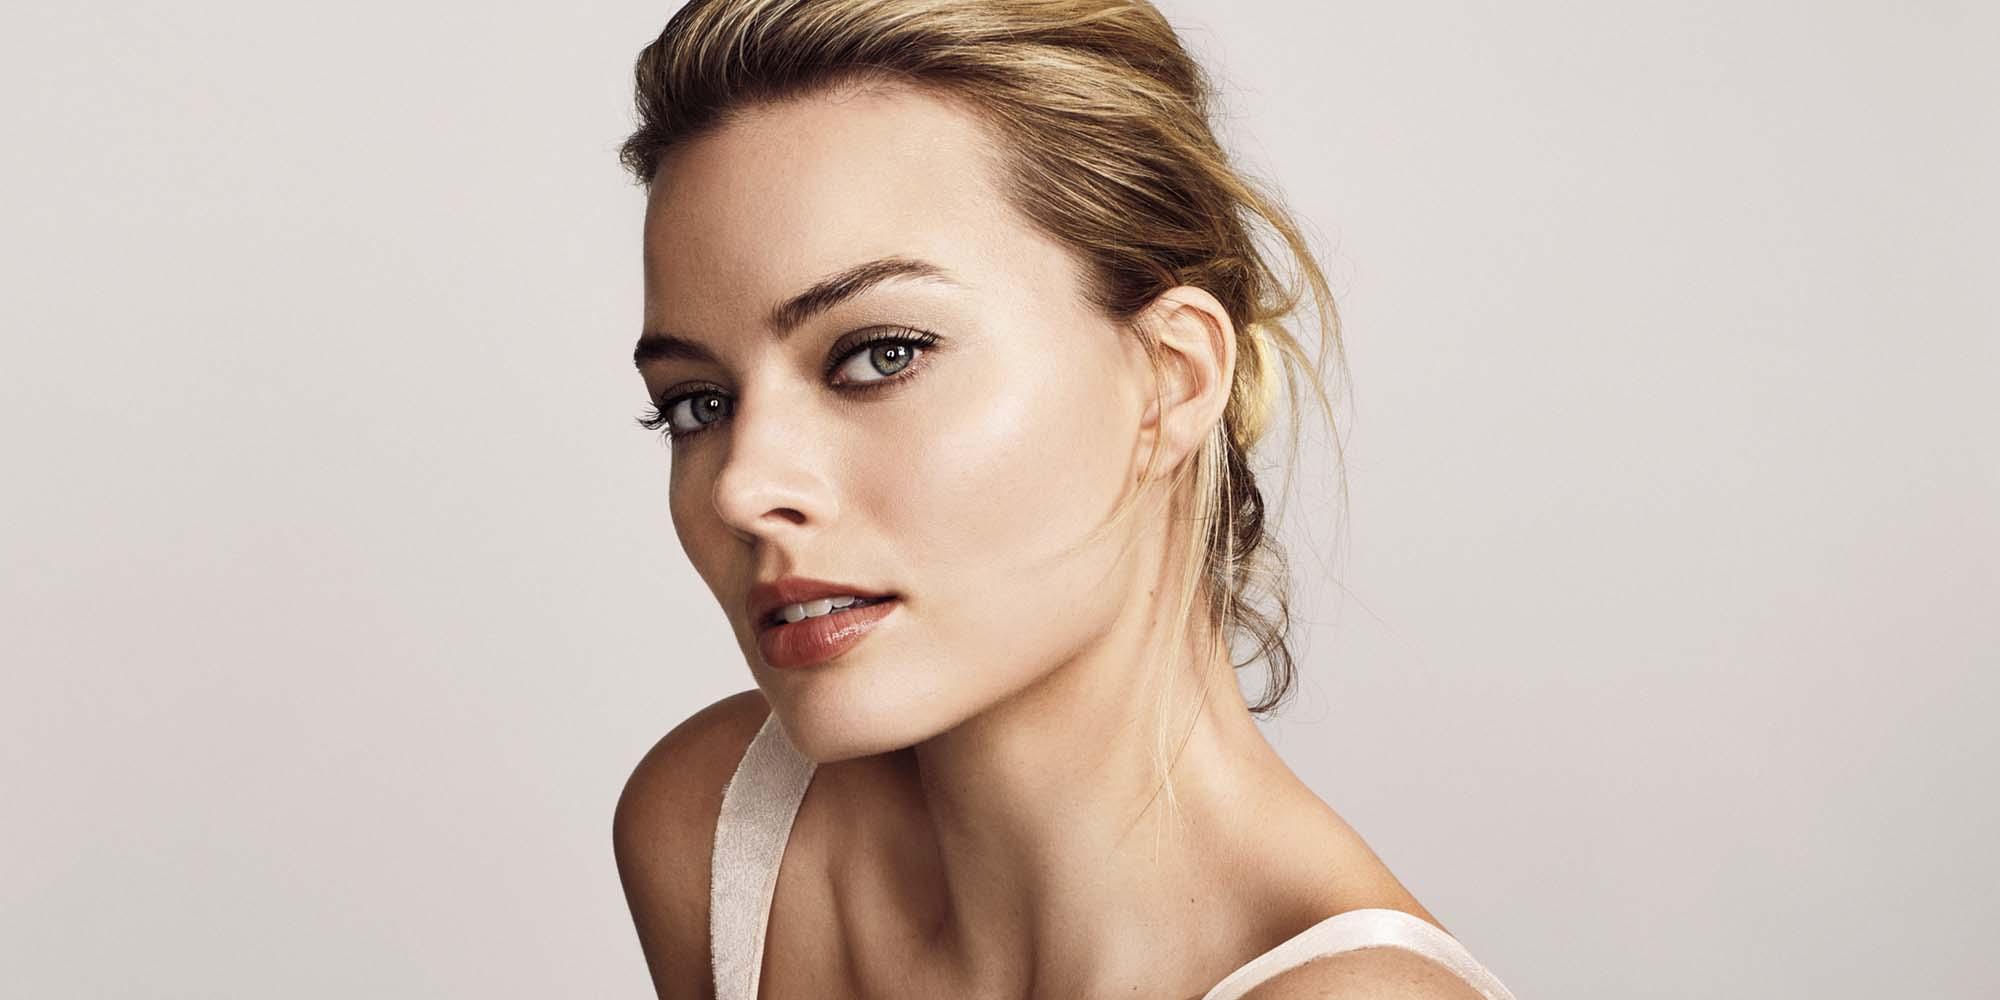 Margot Robbie Wiki: Age, Net Worth, Husband, & Facts To Know